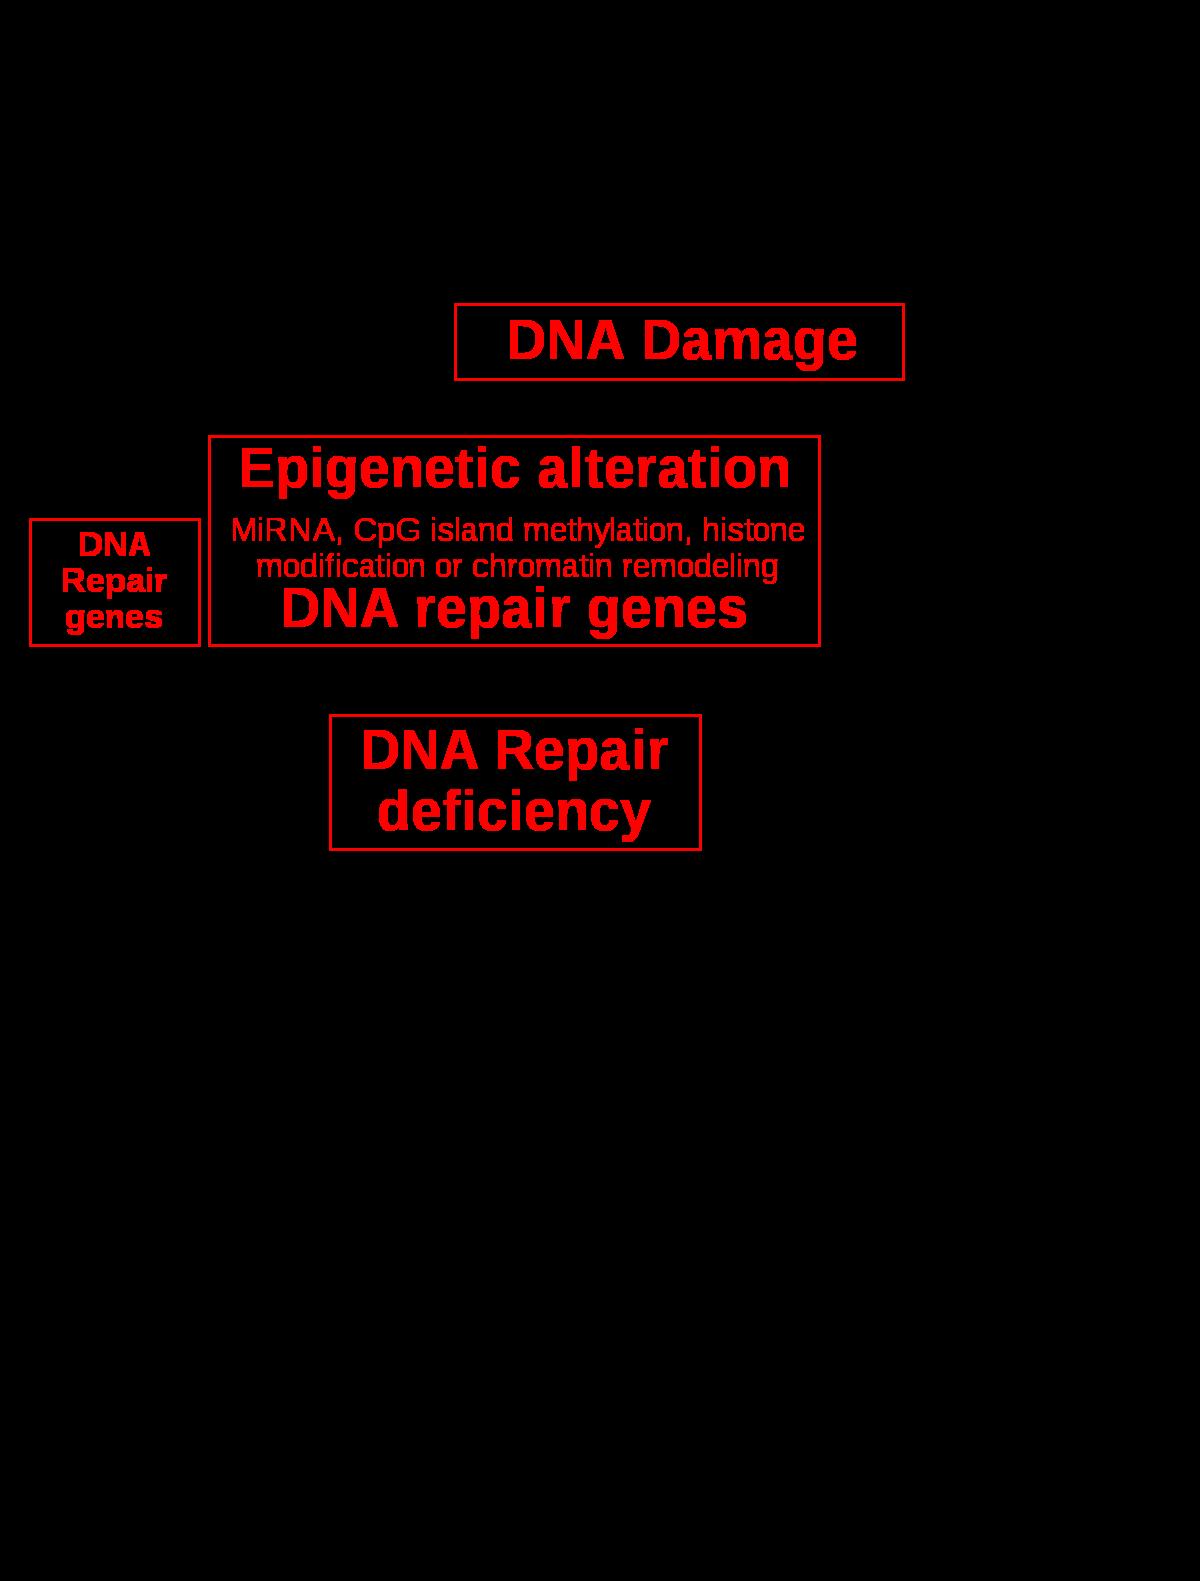 hpv oropharyngealis rák kora